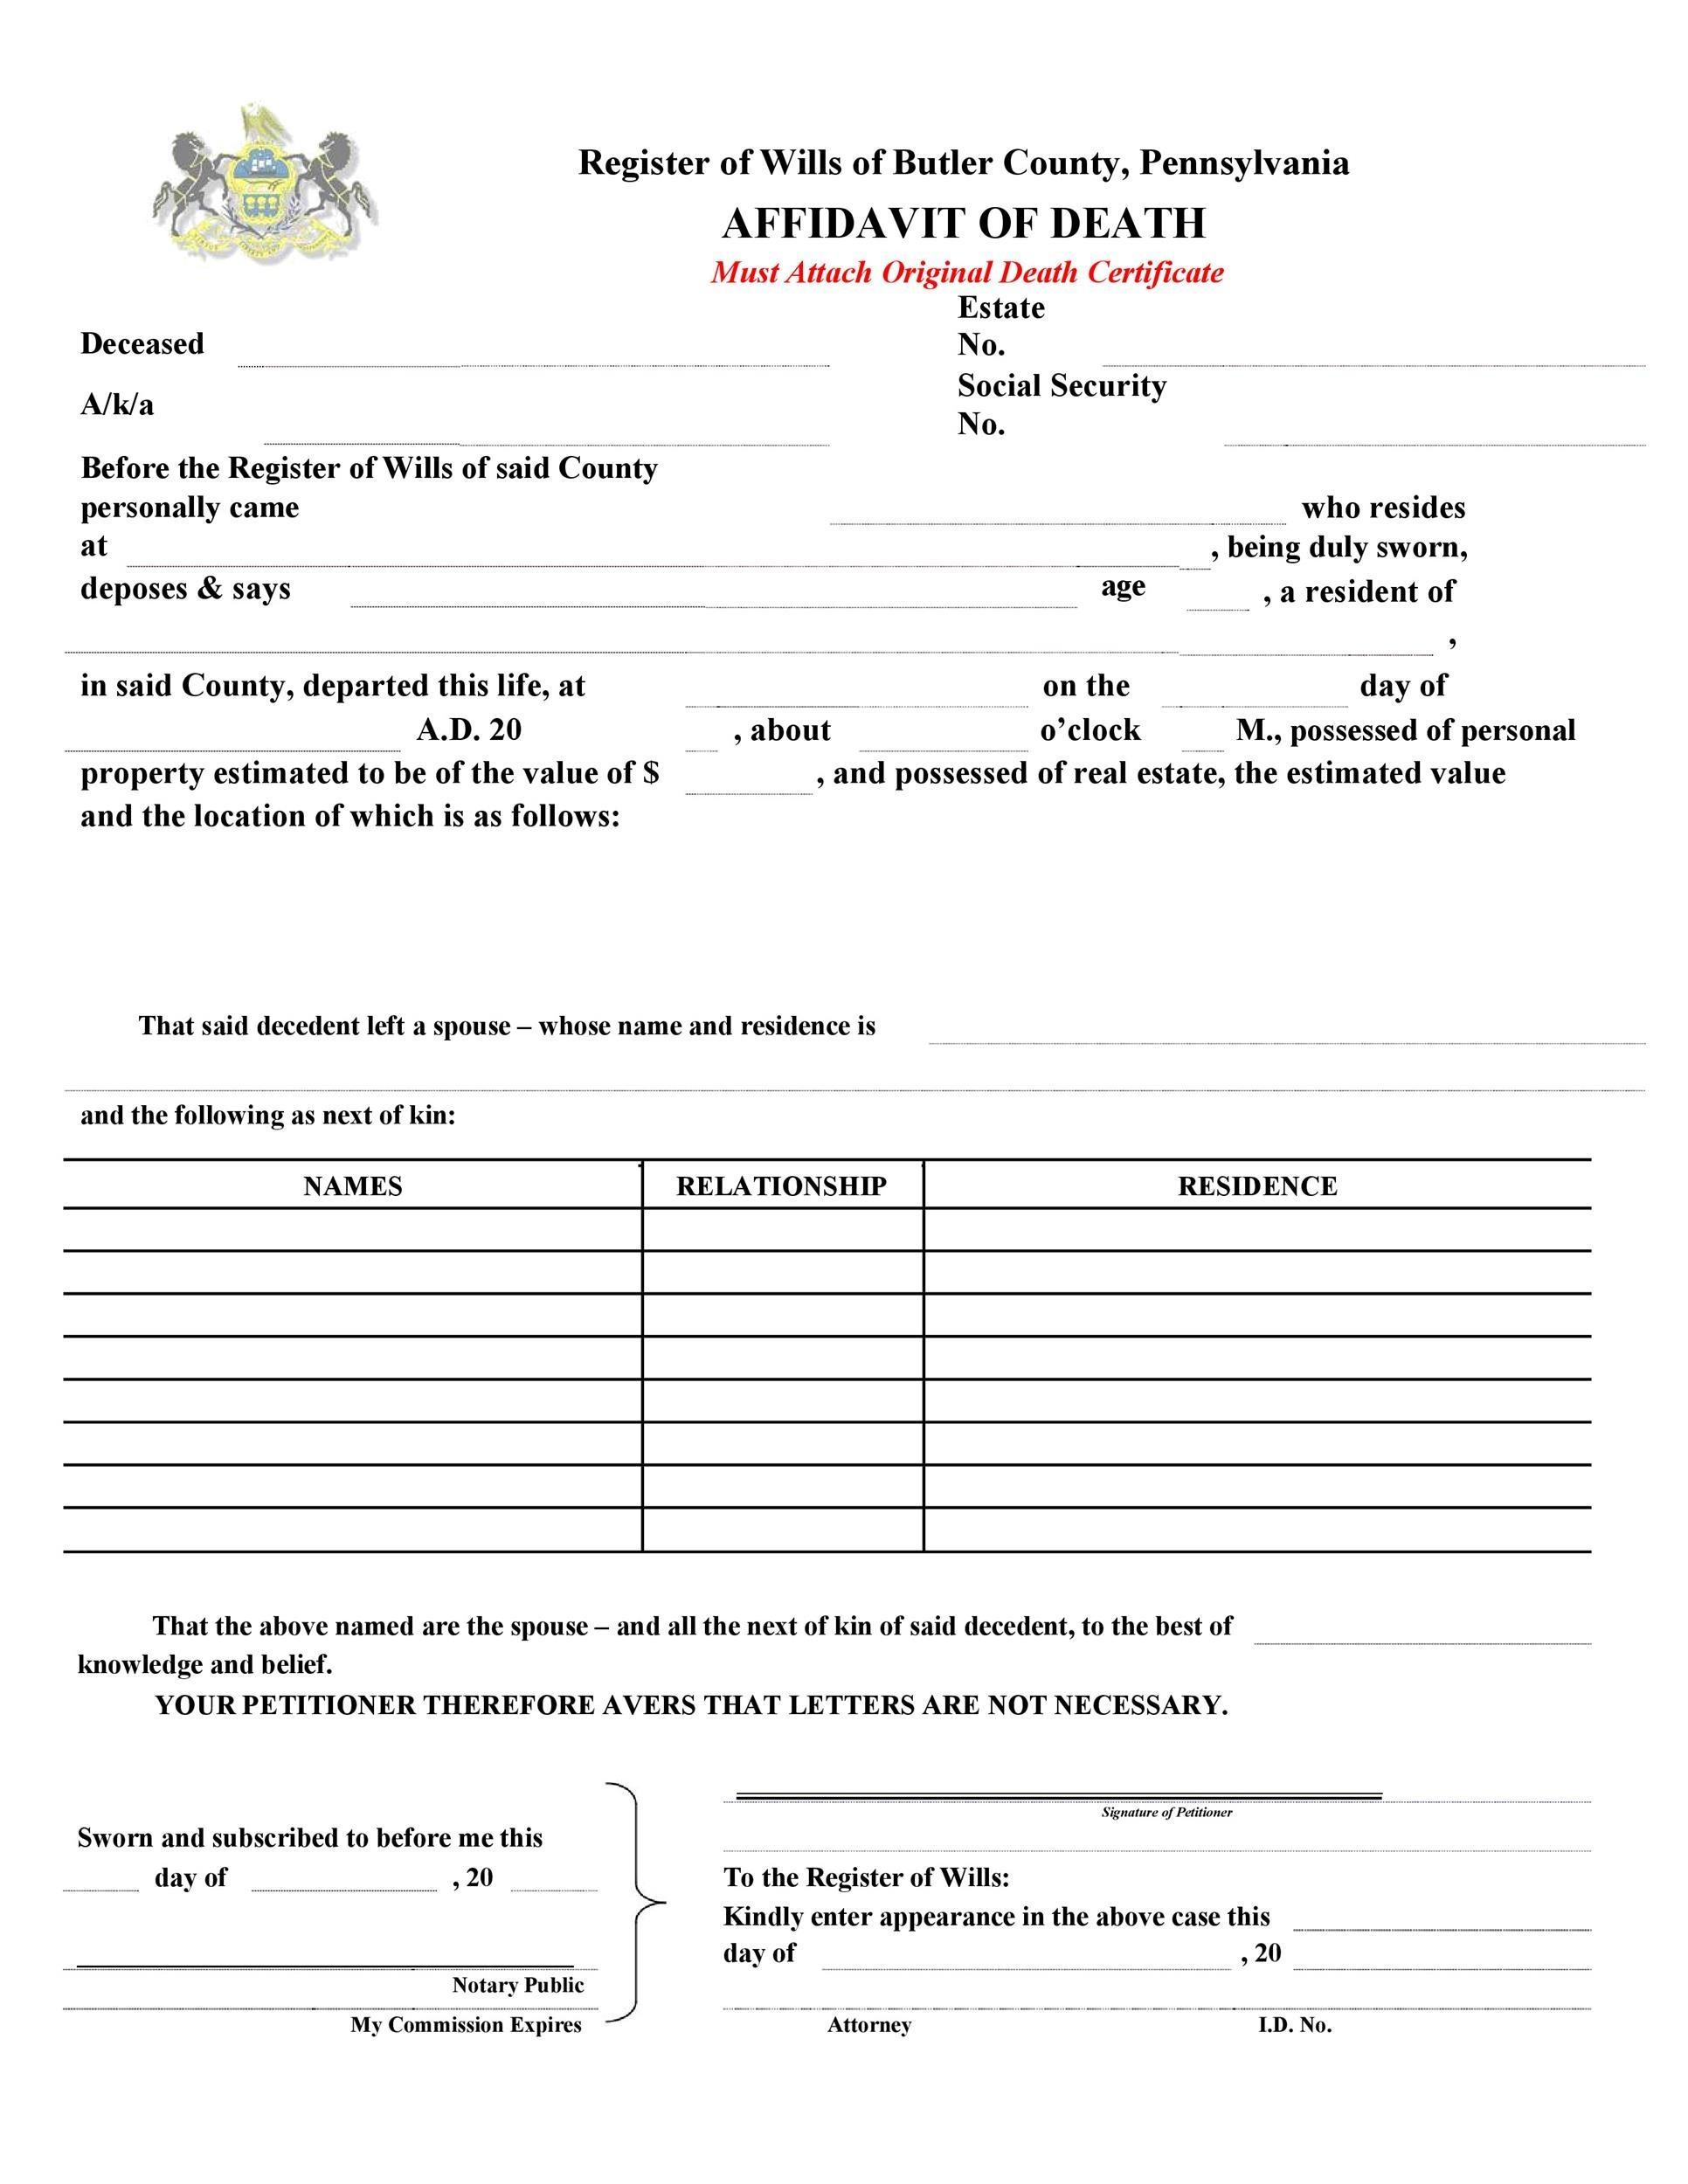 Free affidavit of death 05